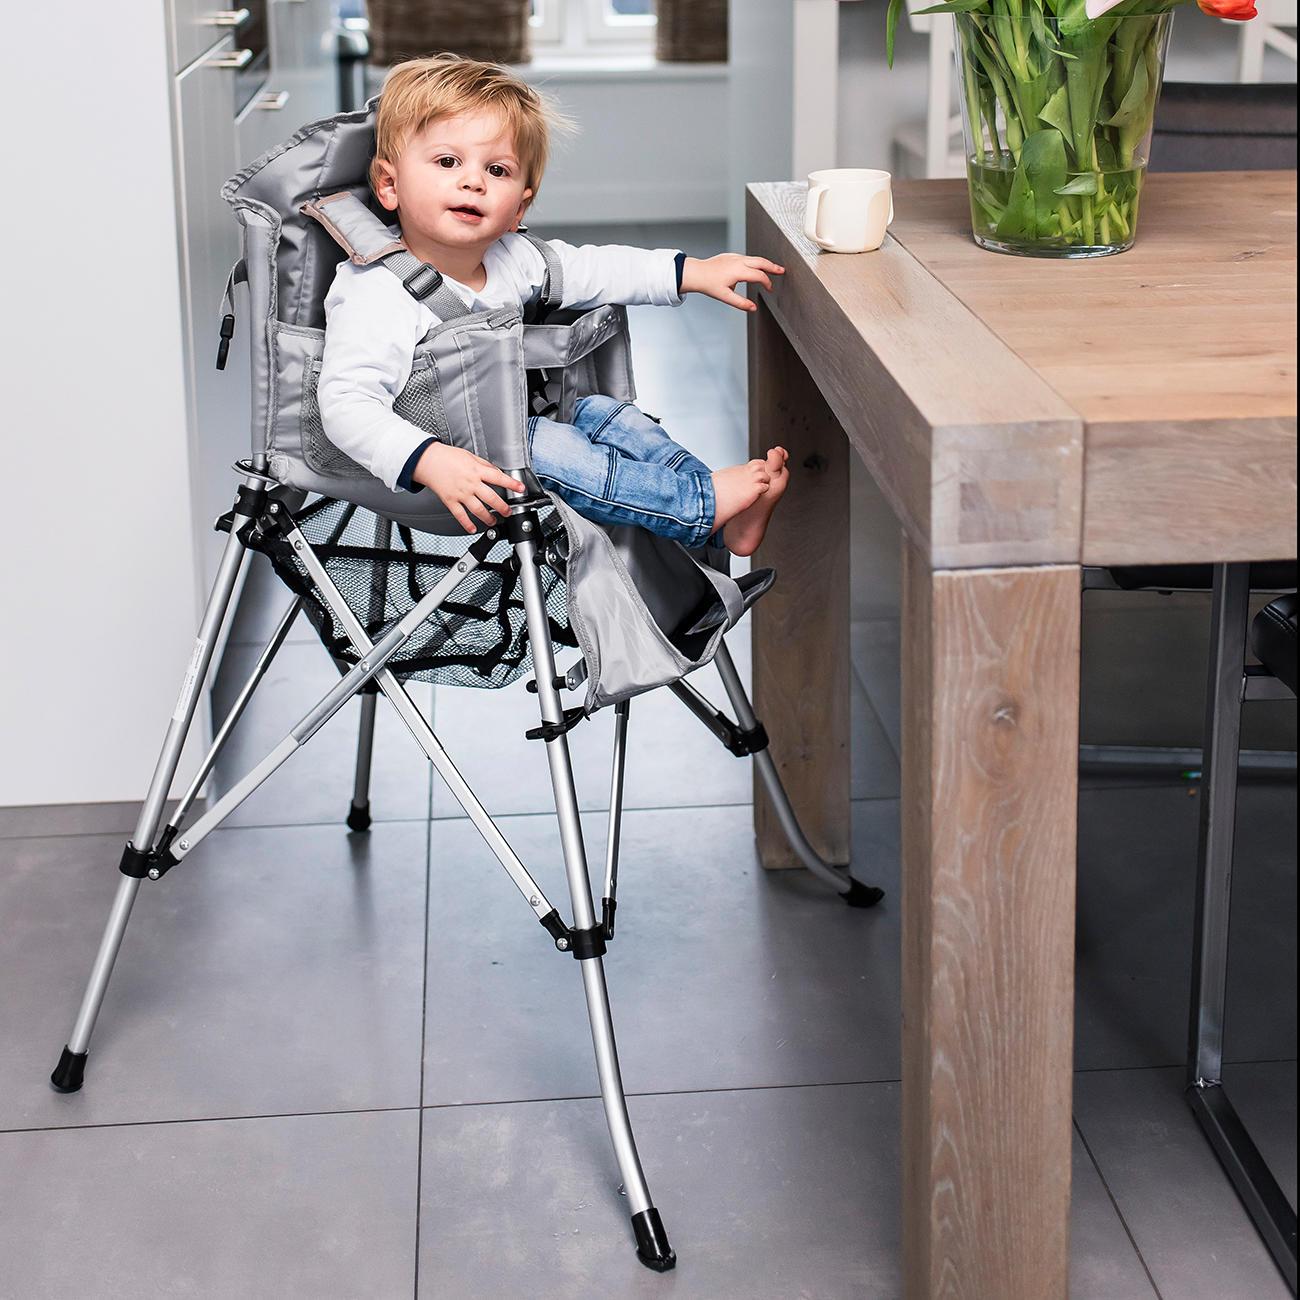 Opvouwbare Reis Kinderstoel.Opvouwbare Hoge Kinderstoel Goedkoop Online Kopen